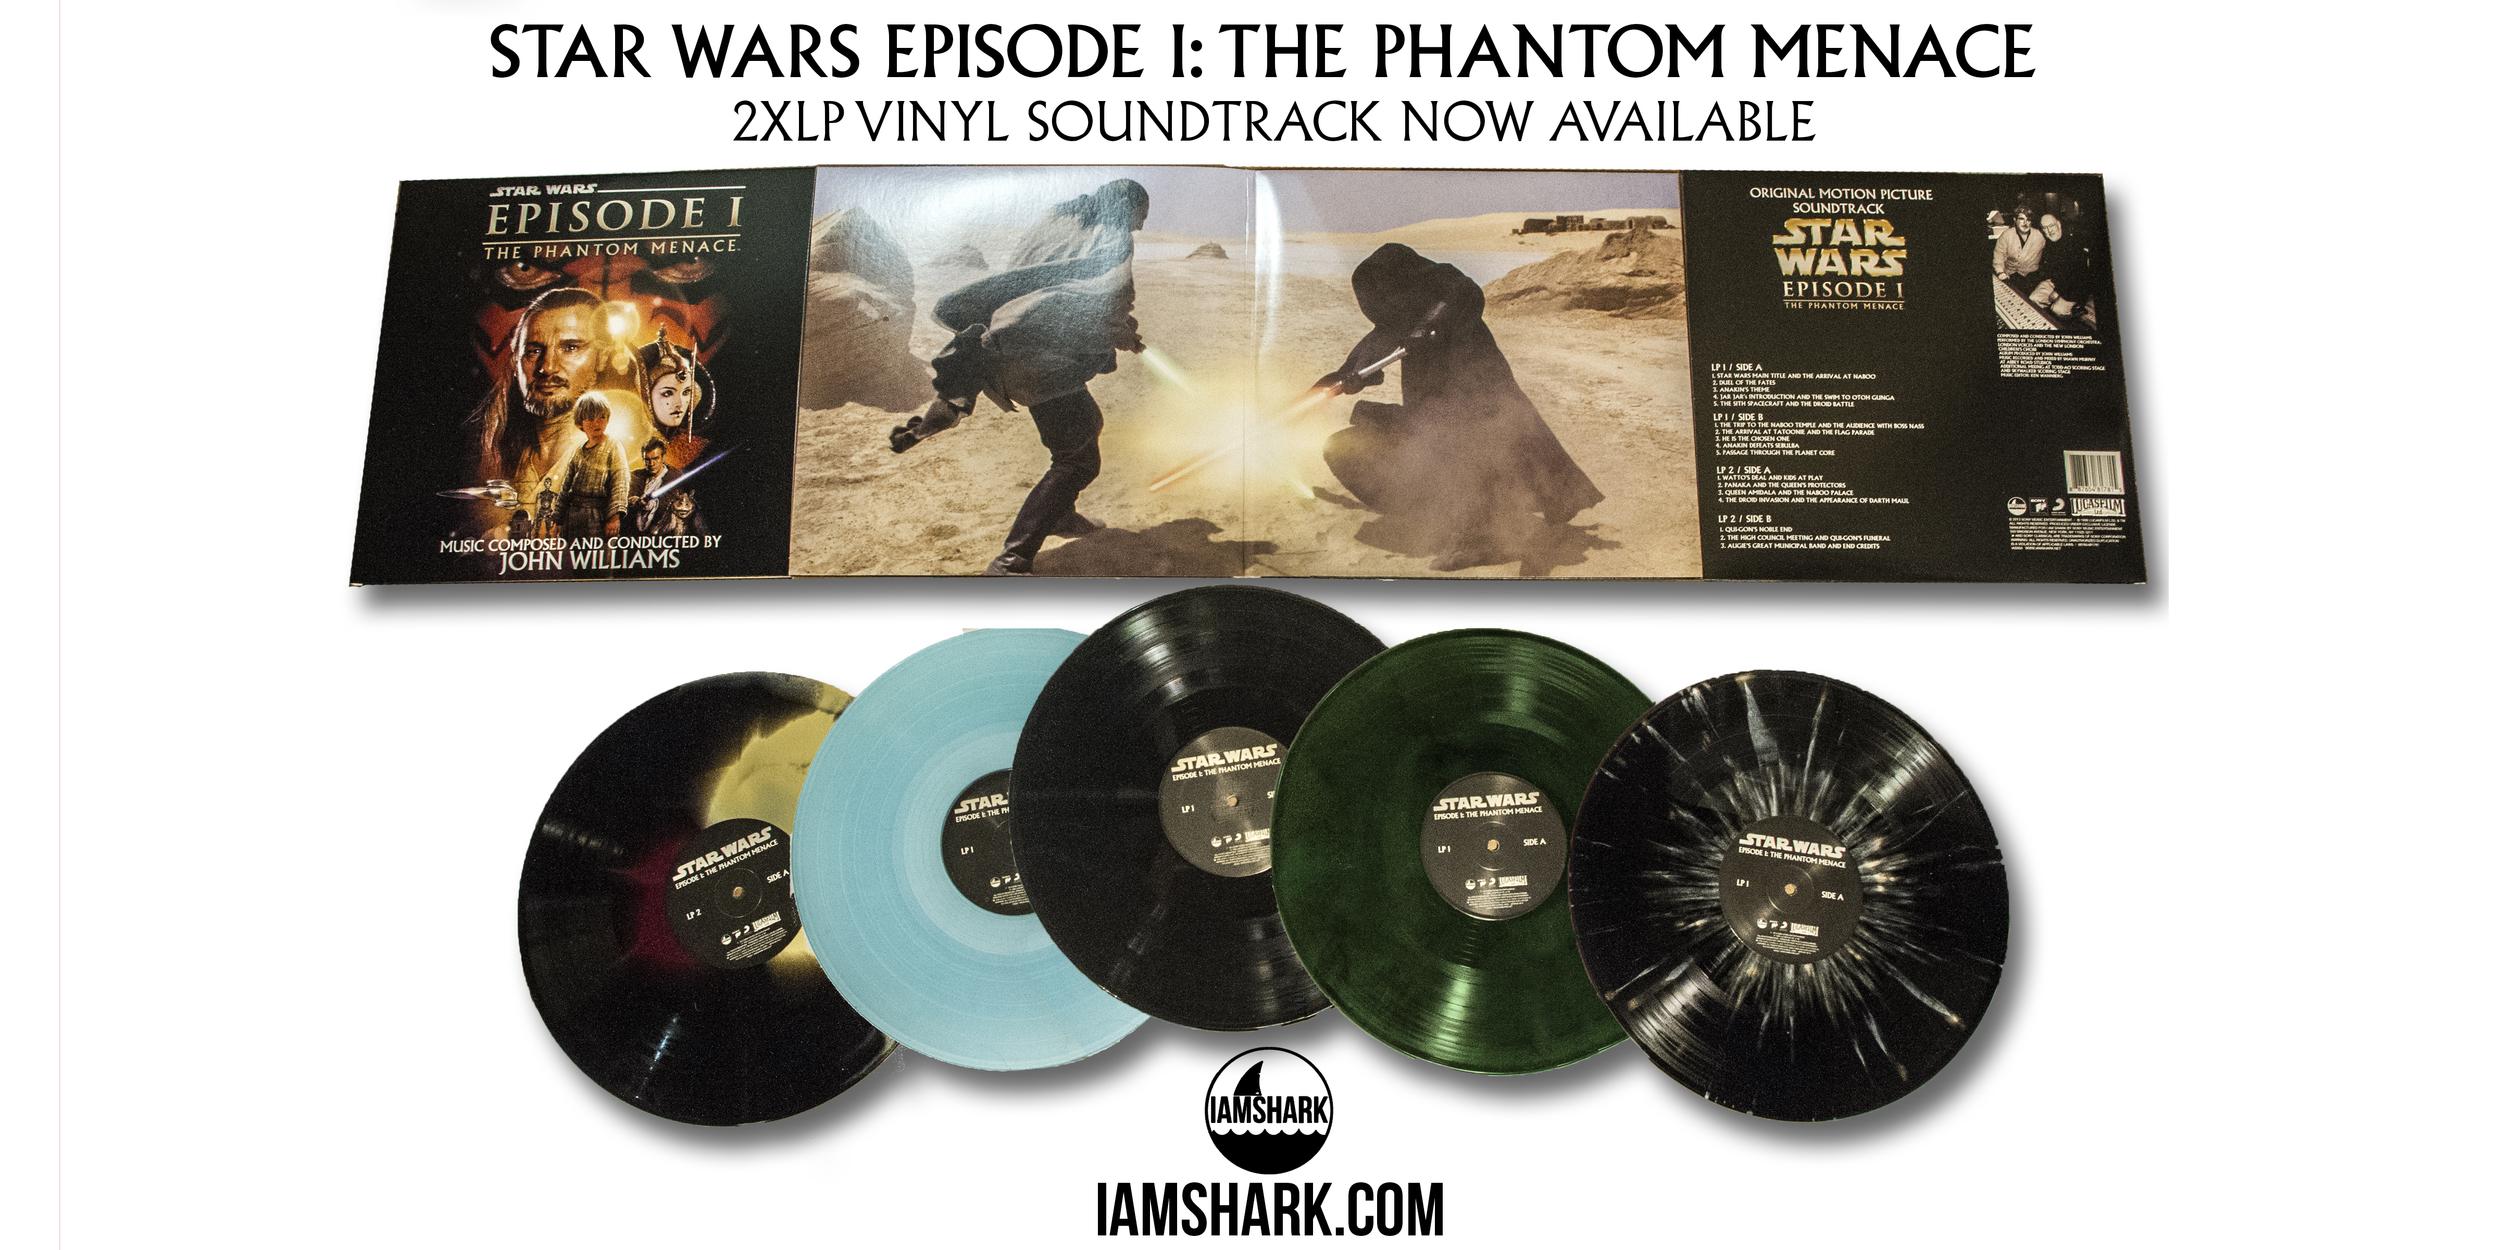 Star Wars Episode 1: The Phantom Menace OST